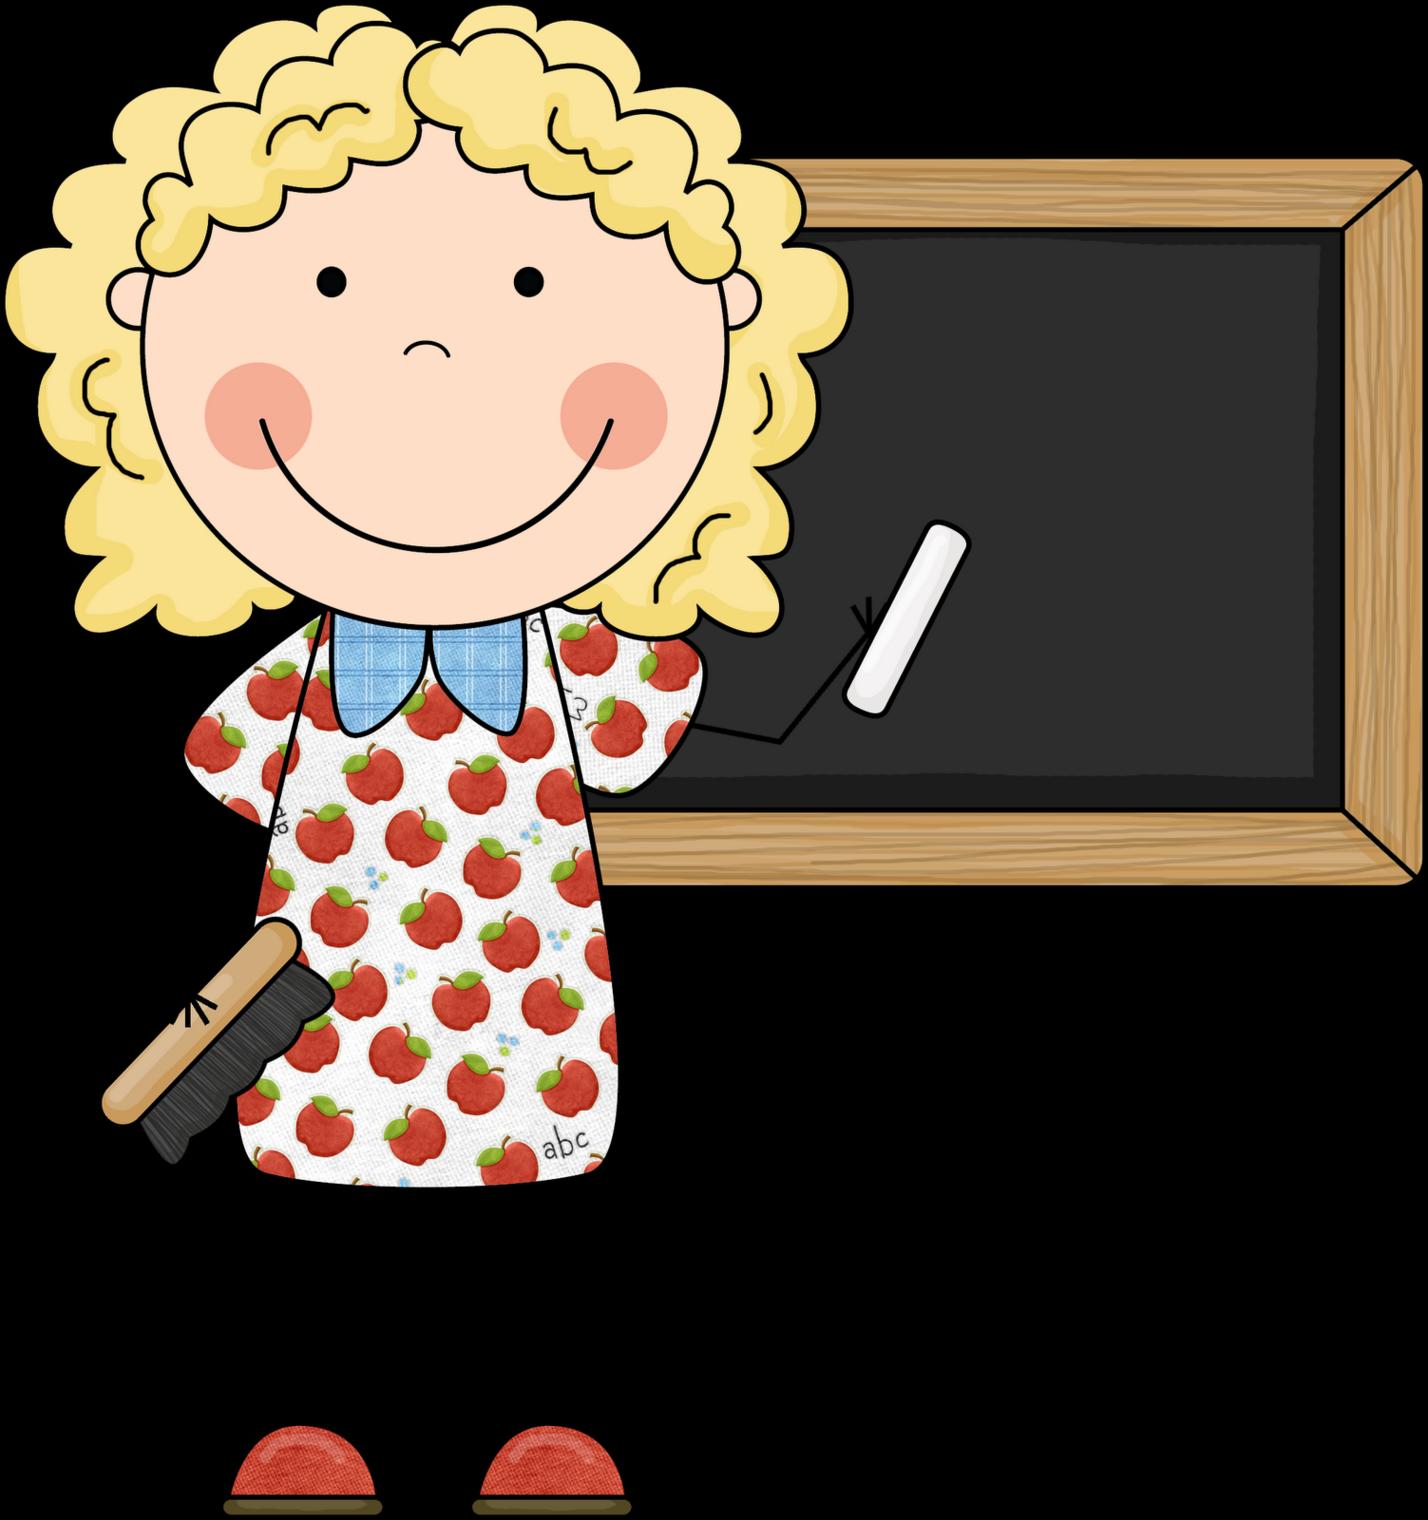 1428x1520 Kindergarten Cartoon Clipart Free To Use Clip Art Resource